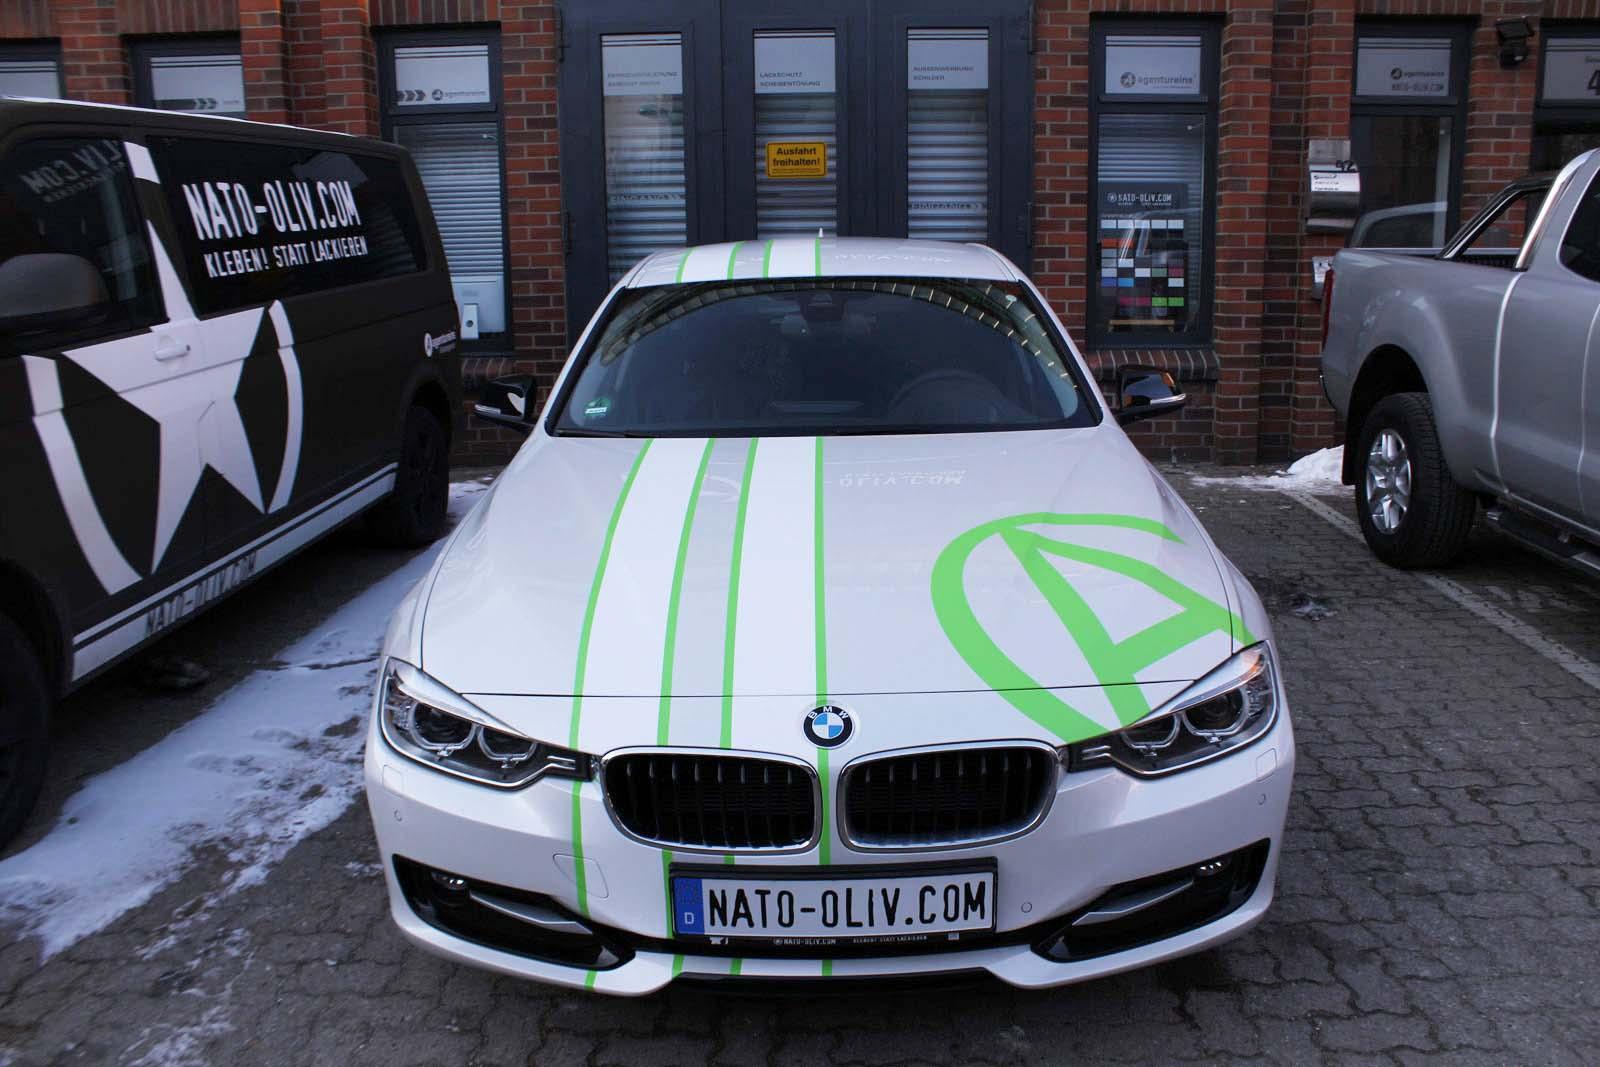 BMW_3ER_RALLYESTREIFEN_WEISS_GRUEN_MATT_MIT_BRANDING_16